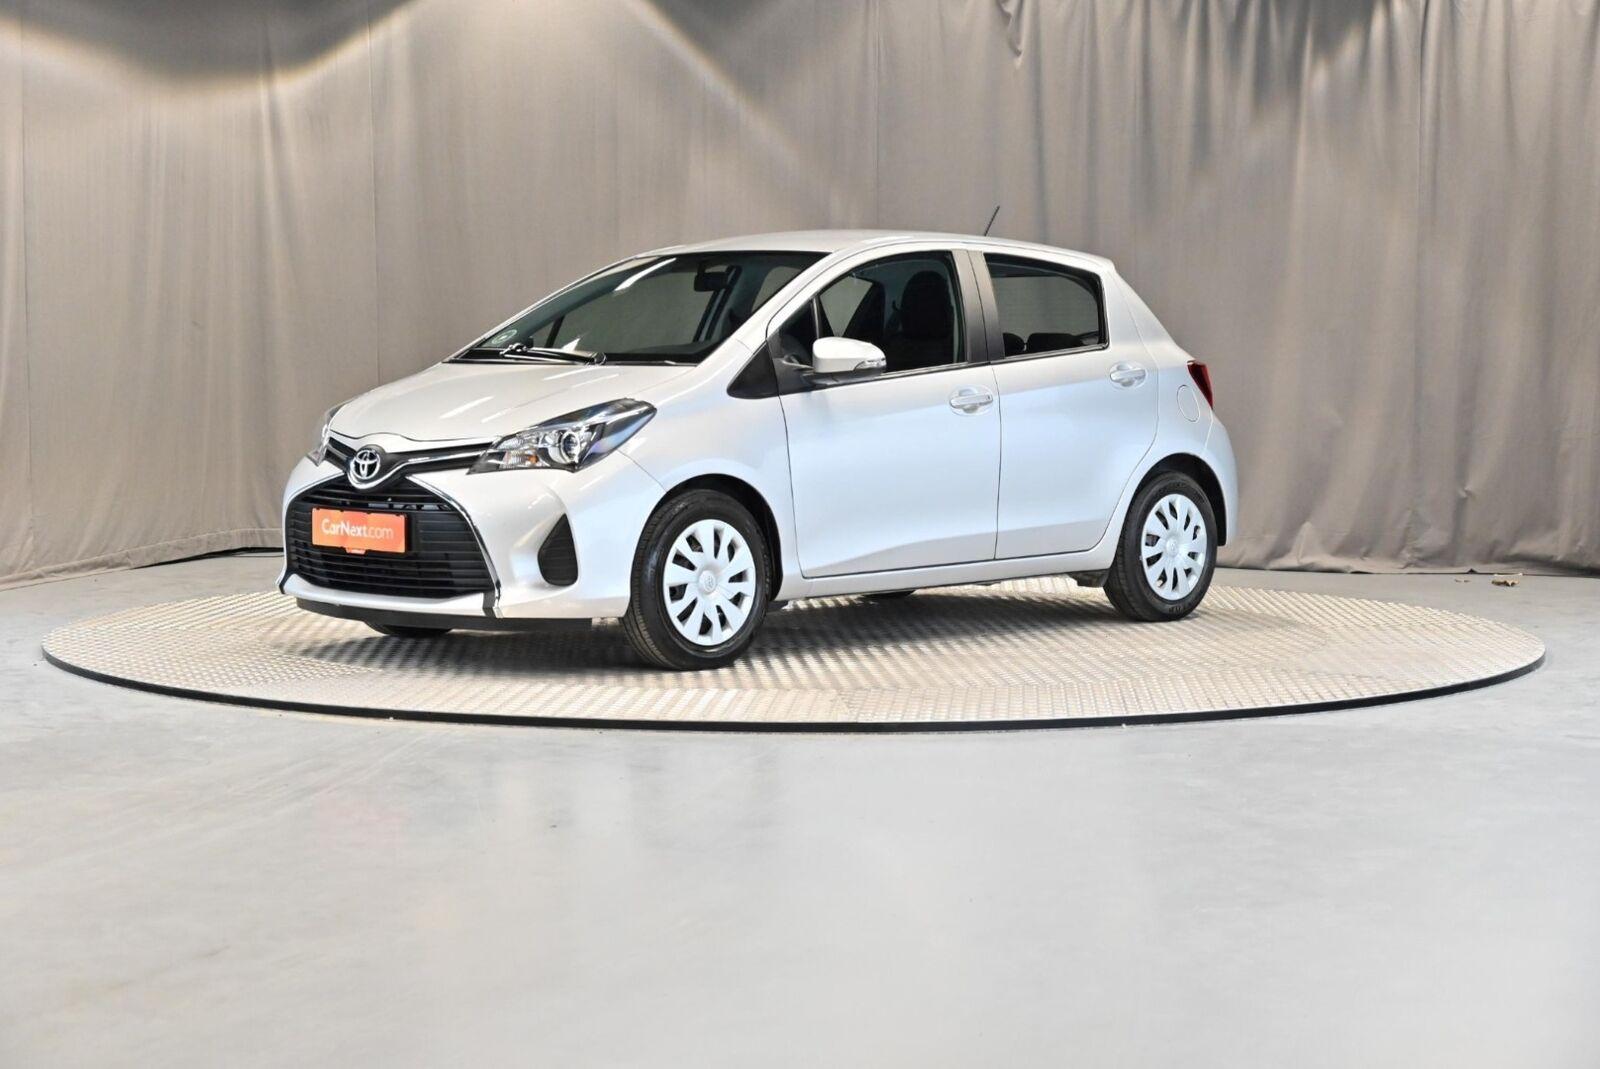 Toyota Yaris 1,0 VVT-i T2 5d - 89.900 kr.